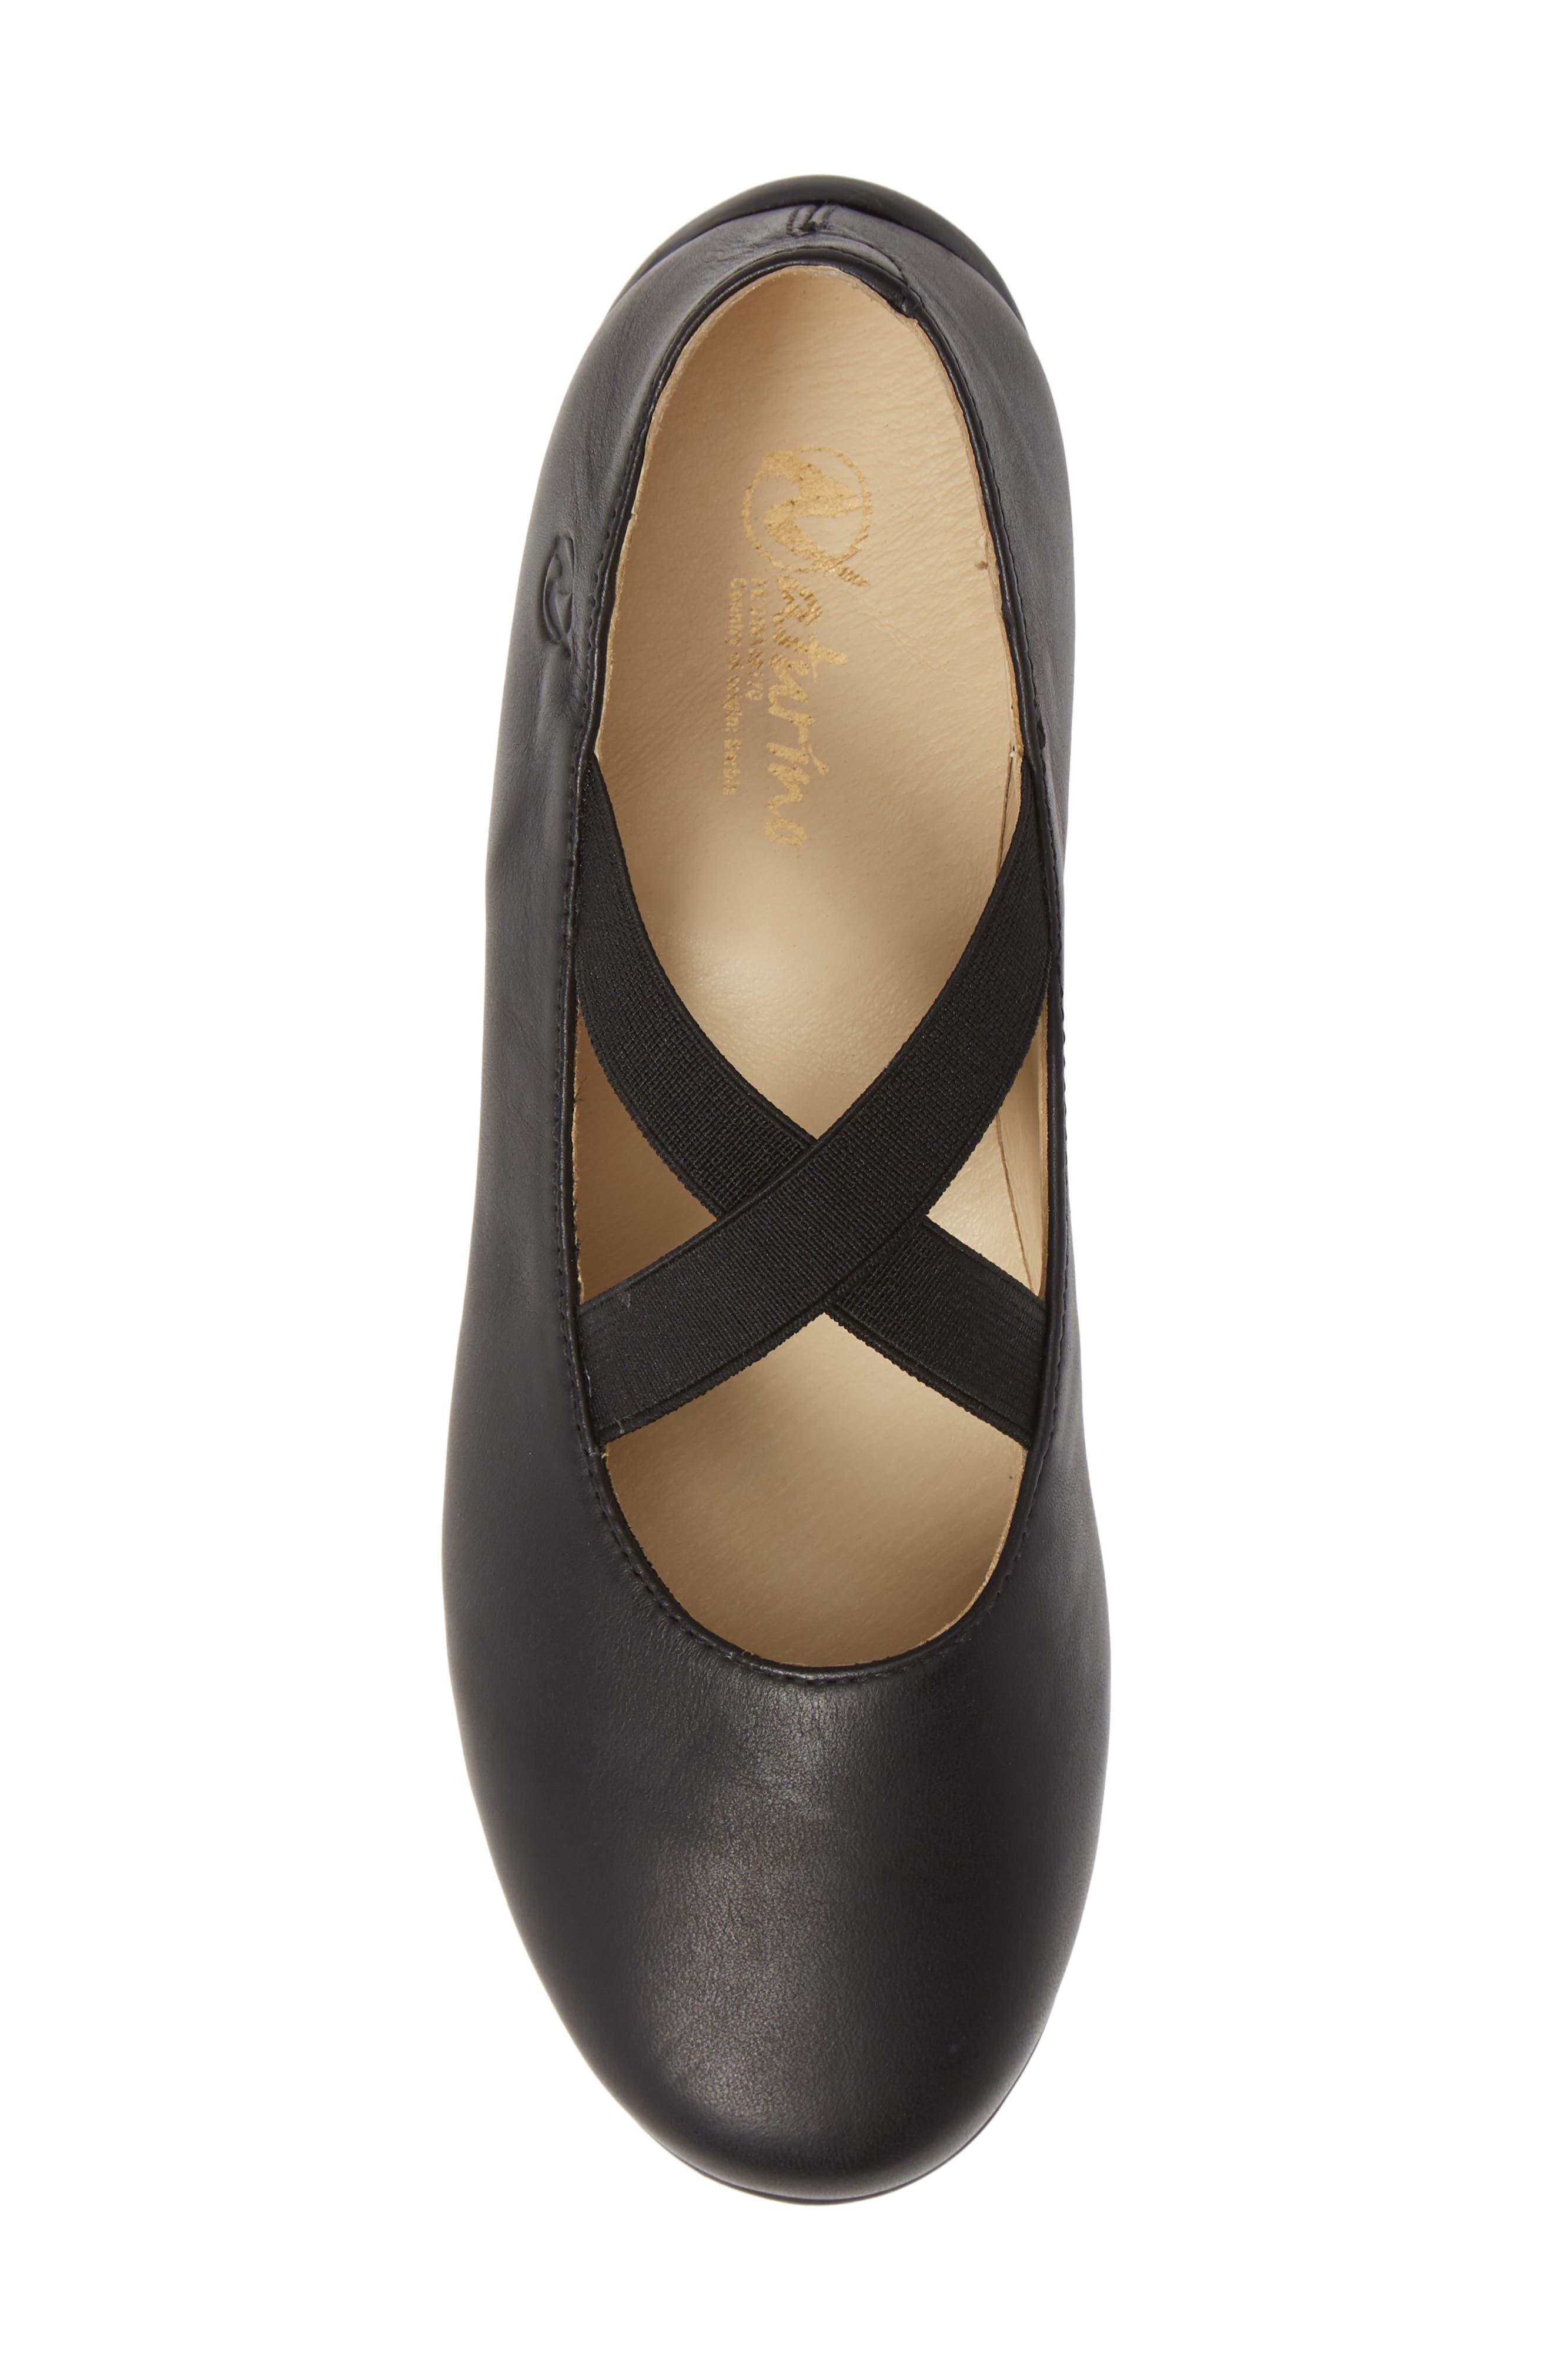 Matera Ballet Flat,                             Alternate thumbnail 6, color,                             Black Leather